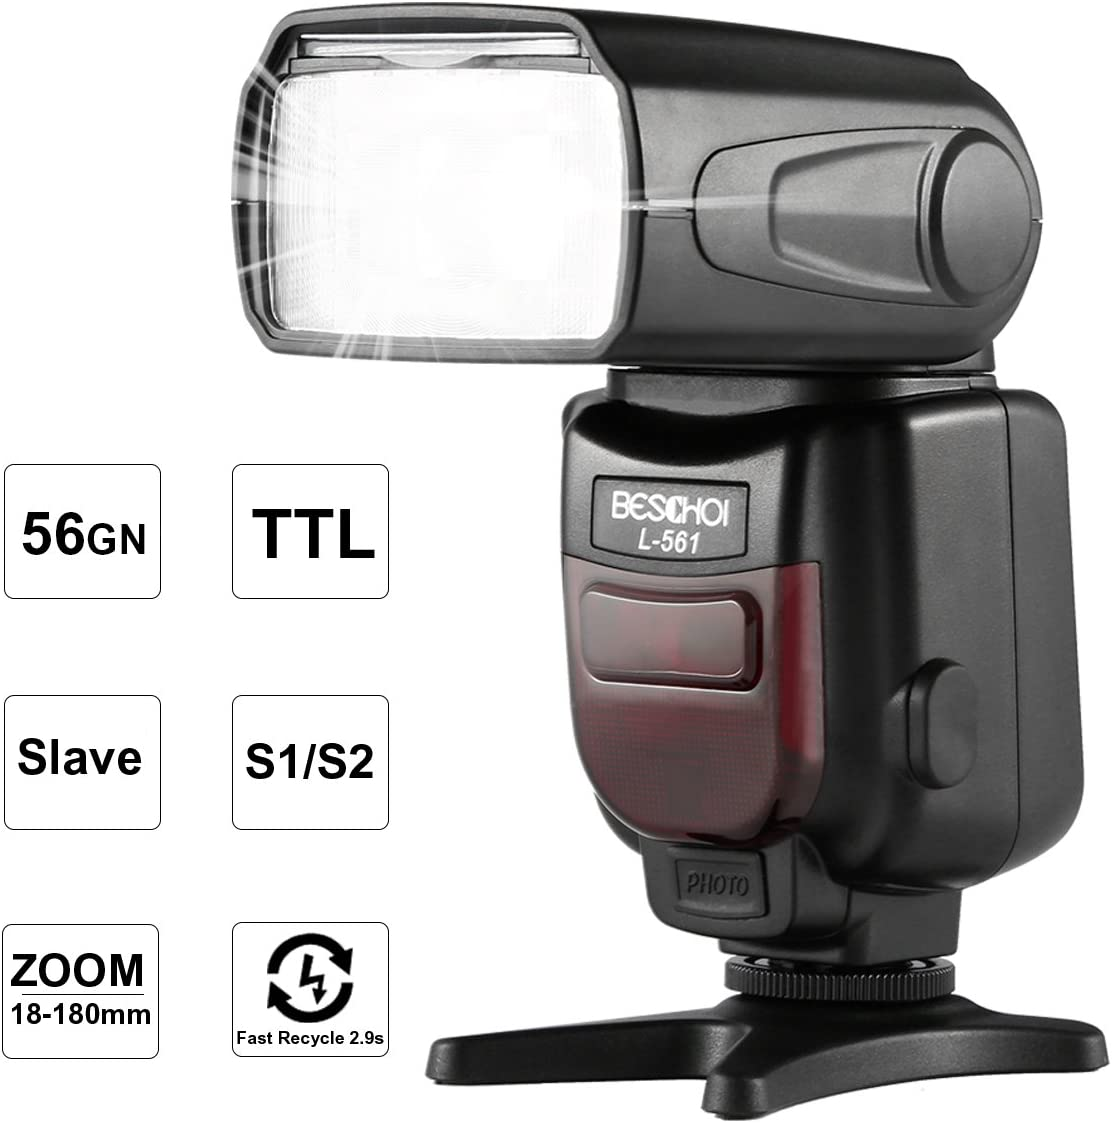 Beschoi i-TTL Flash Speedlite L561 con Pantalla LCD, Esclavo Inalámbrico, GN56 para Cámara Réflex Nikon DSLR